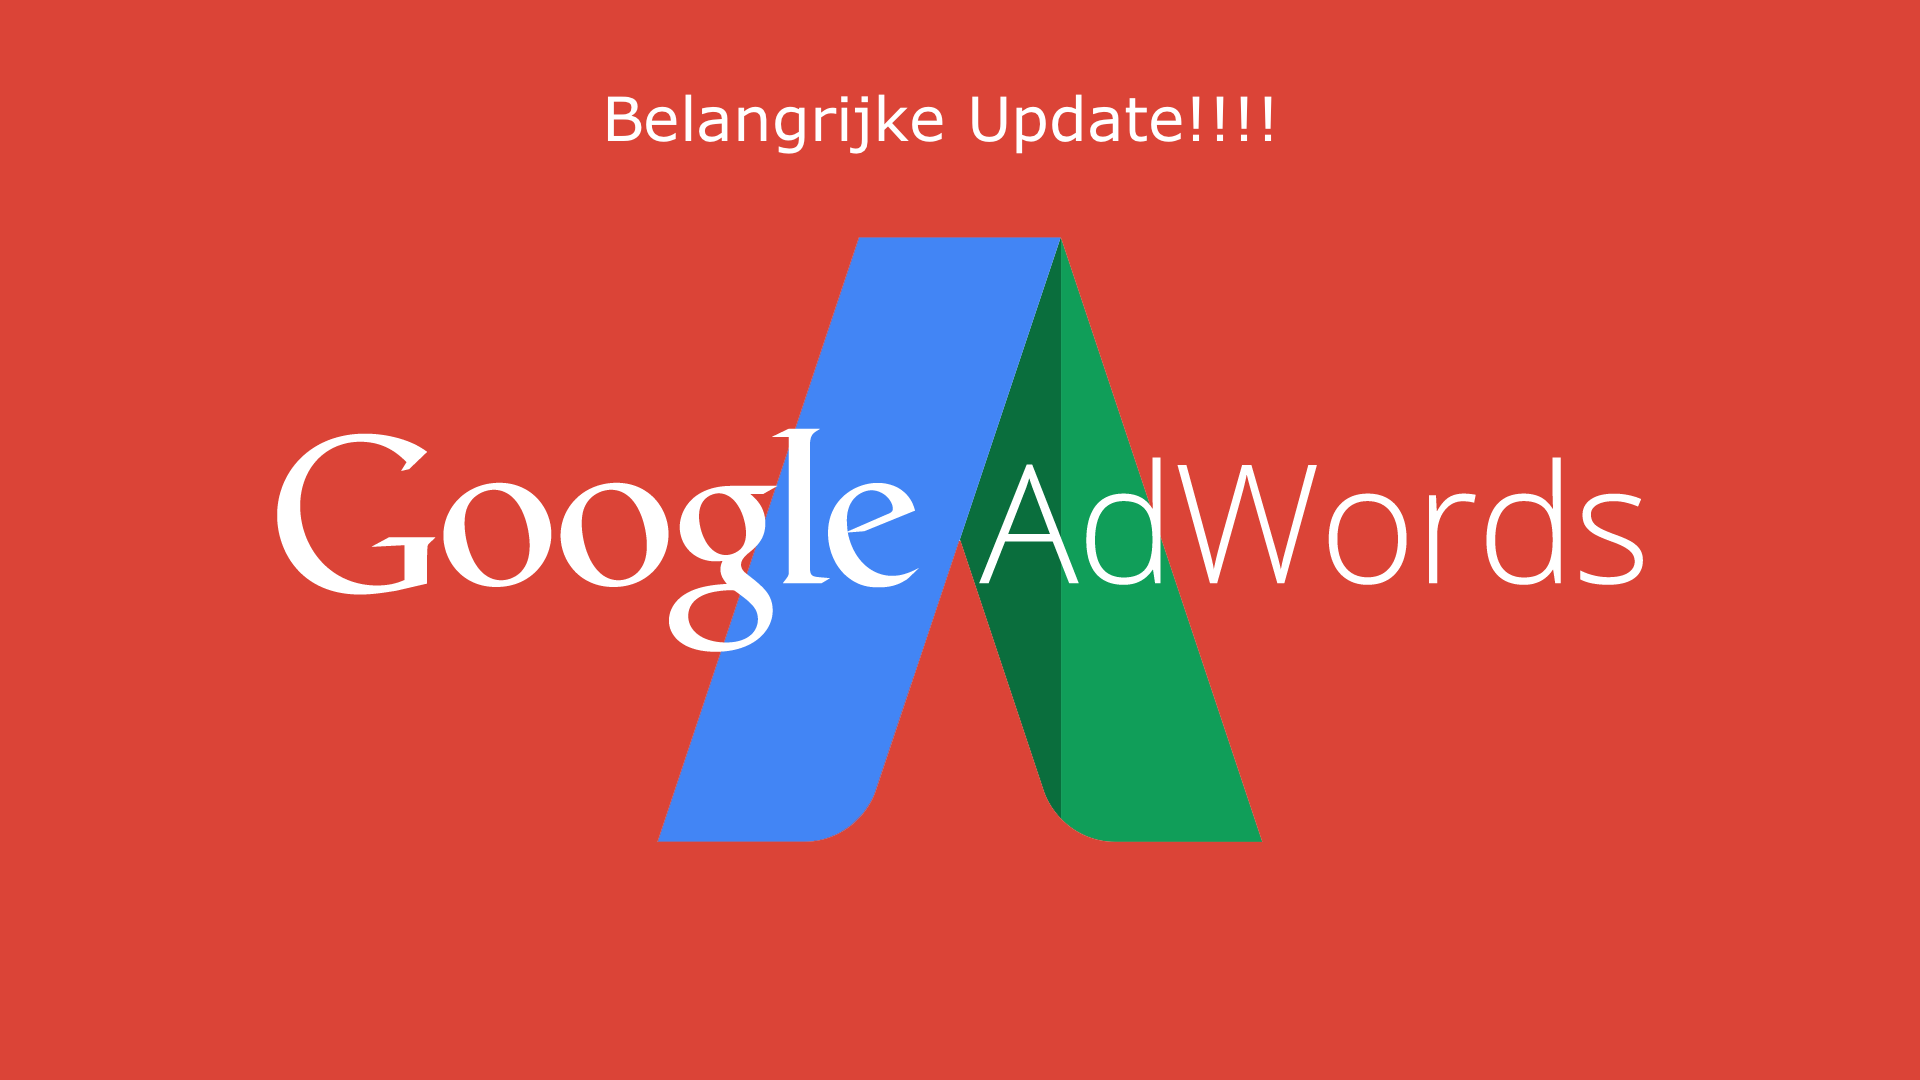 Google Adwords update